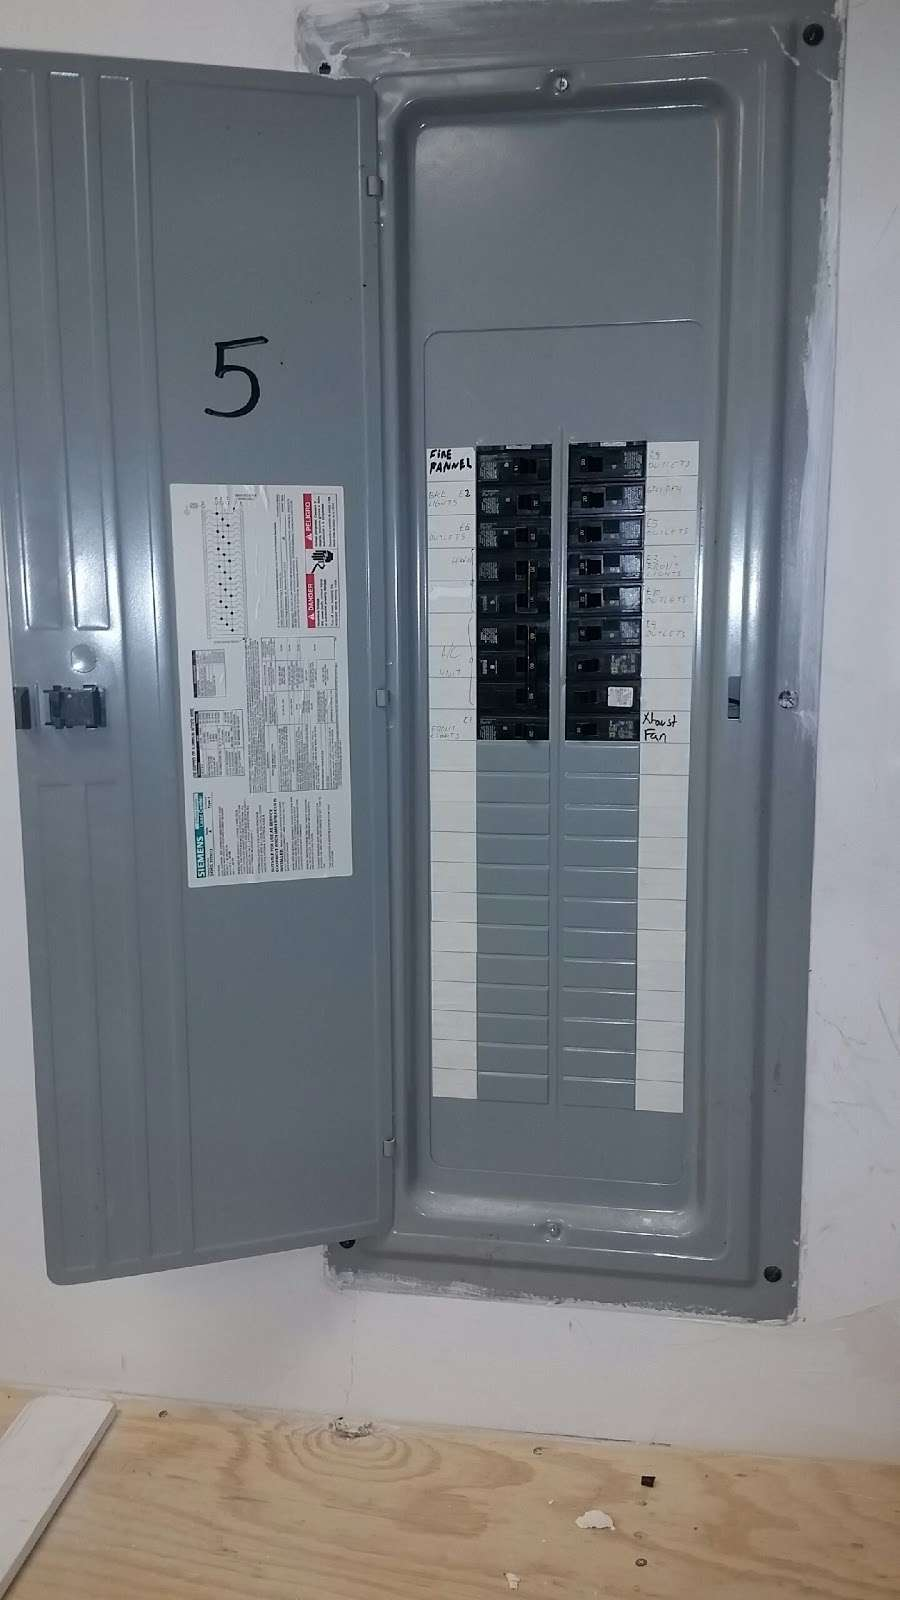 Haddad Electric LLC - electrician  | Photo 10 of 10 | Address: 300 Washington Ave #5, Carlstadt, NJ 07072, USA | Phone: (201) 438-4242